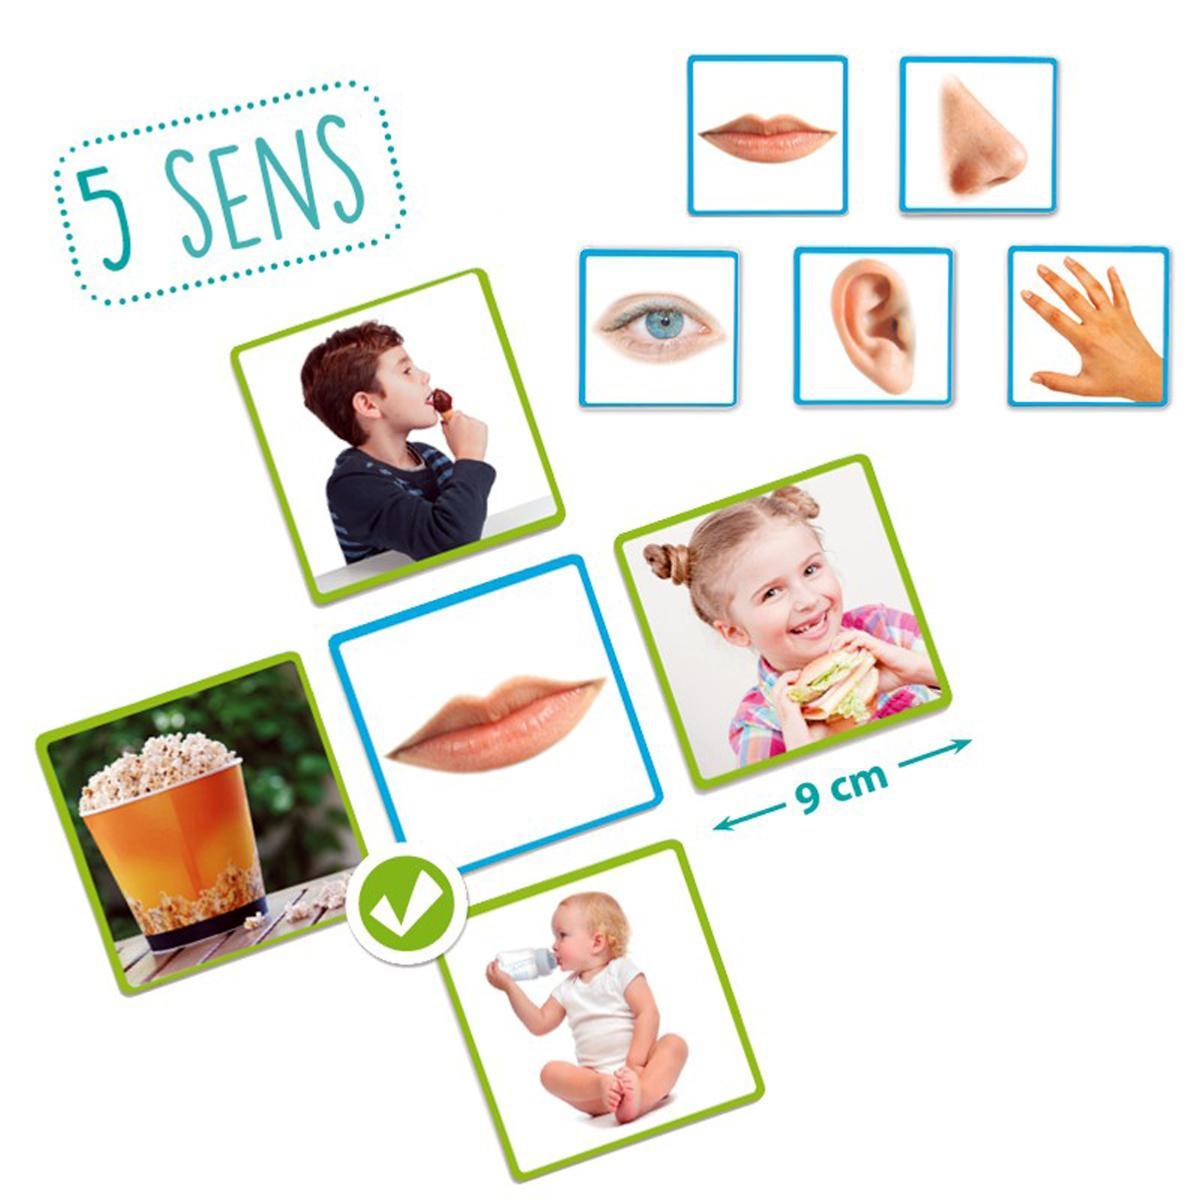 Les 5 Sens pour Jeu Des Cinq Sens